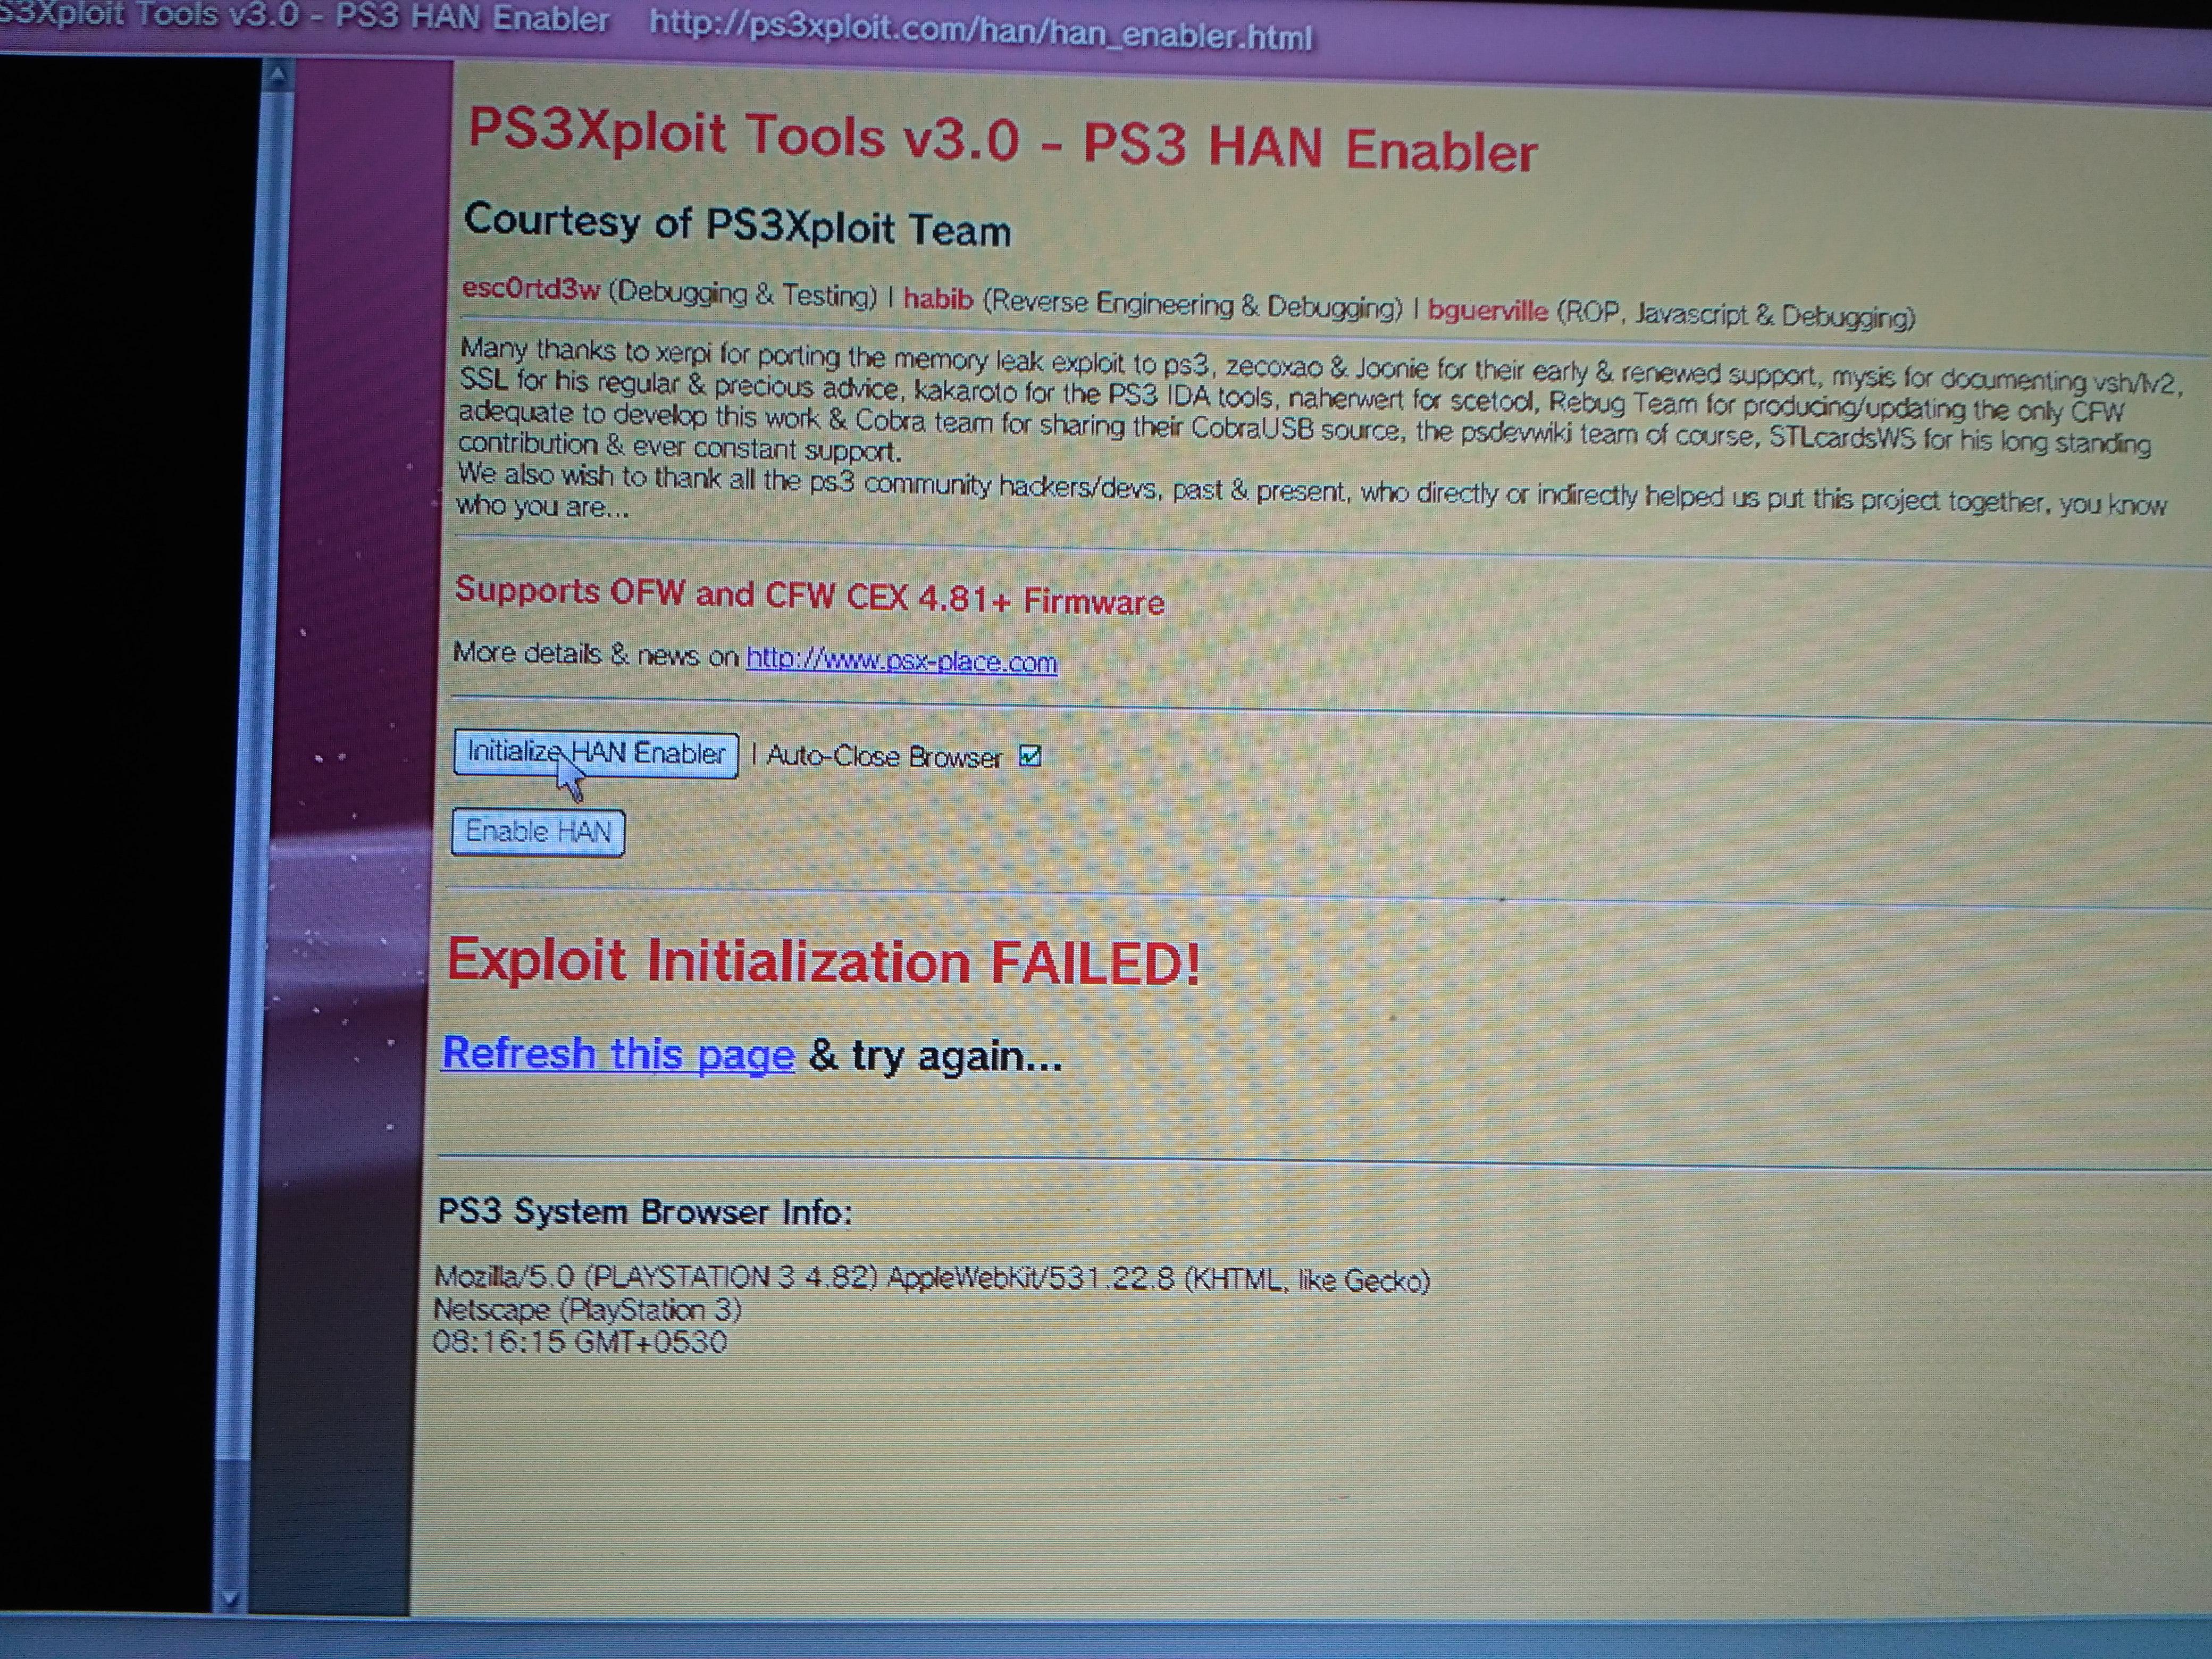 PS3 - PS3Xploit Tools v3 0